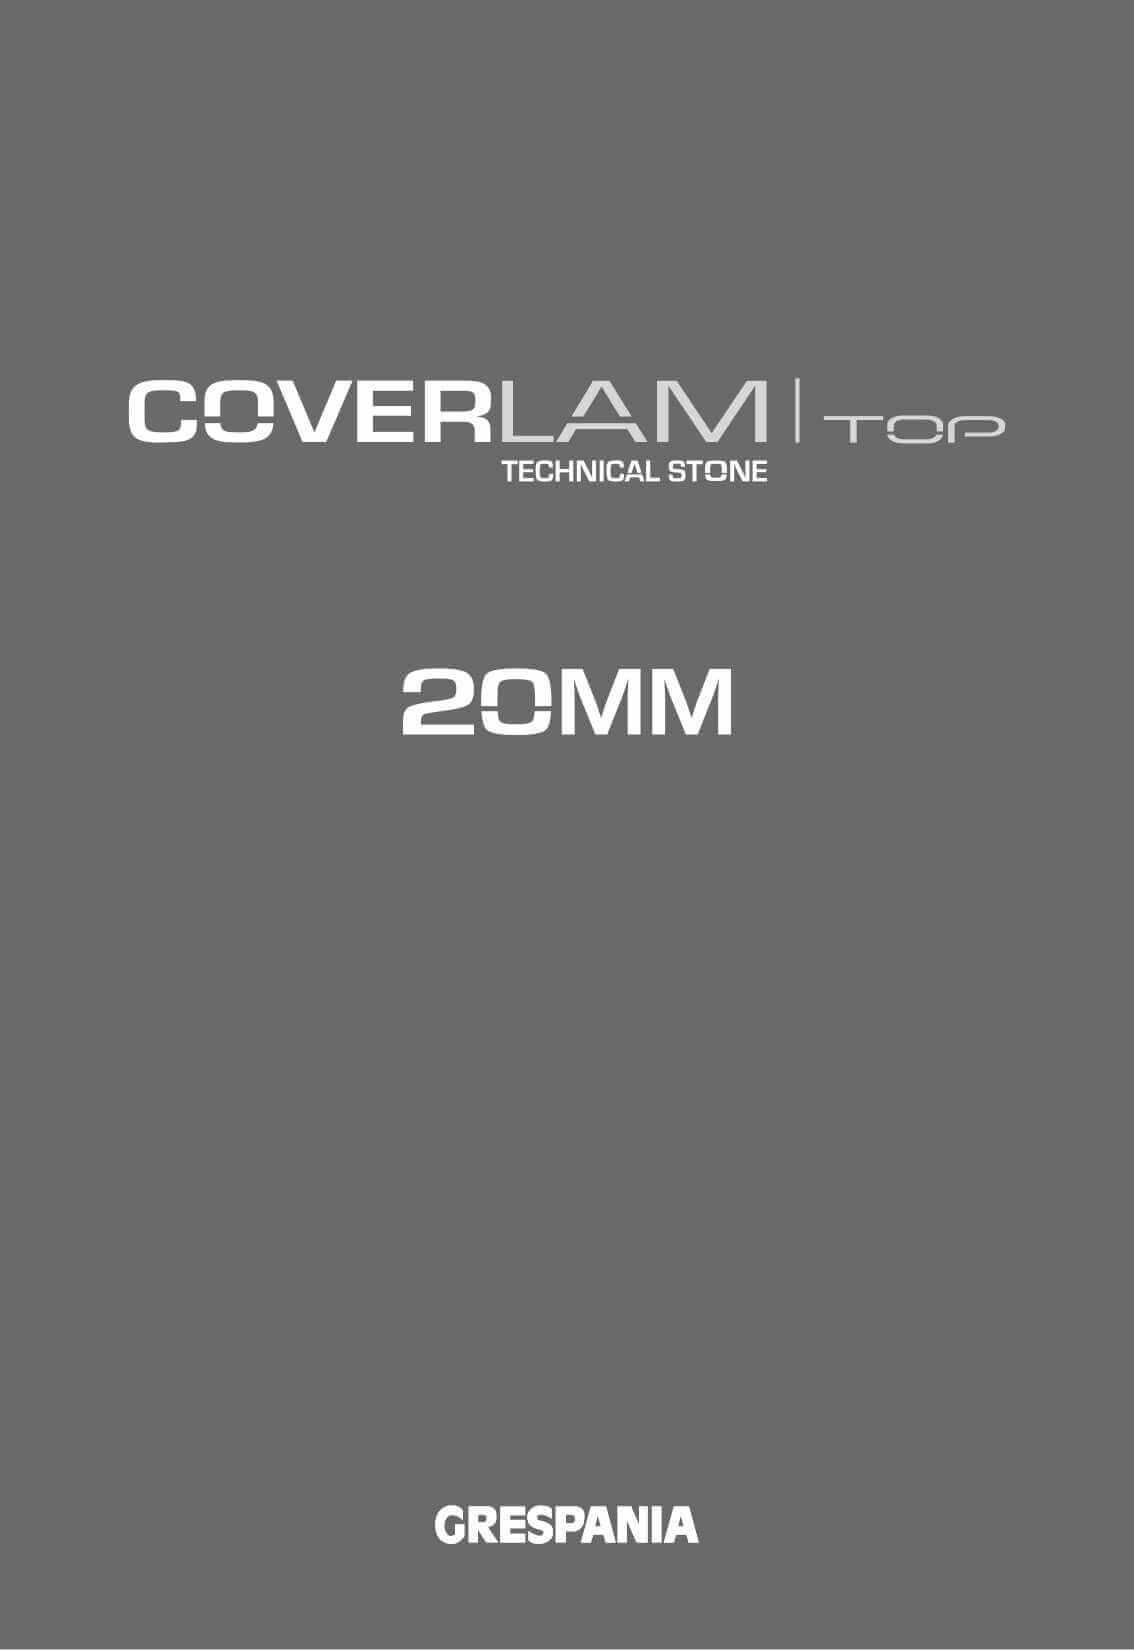 Diptico Coverlam Top 20mm | Catálogos Coverlam Top